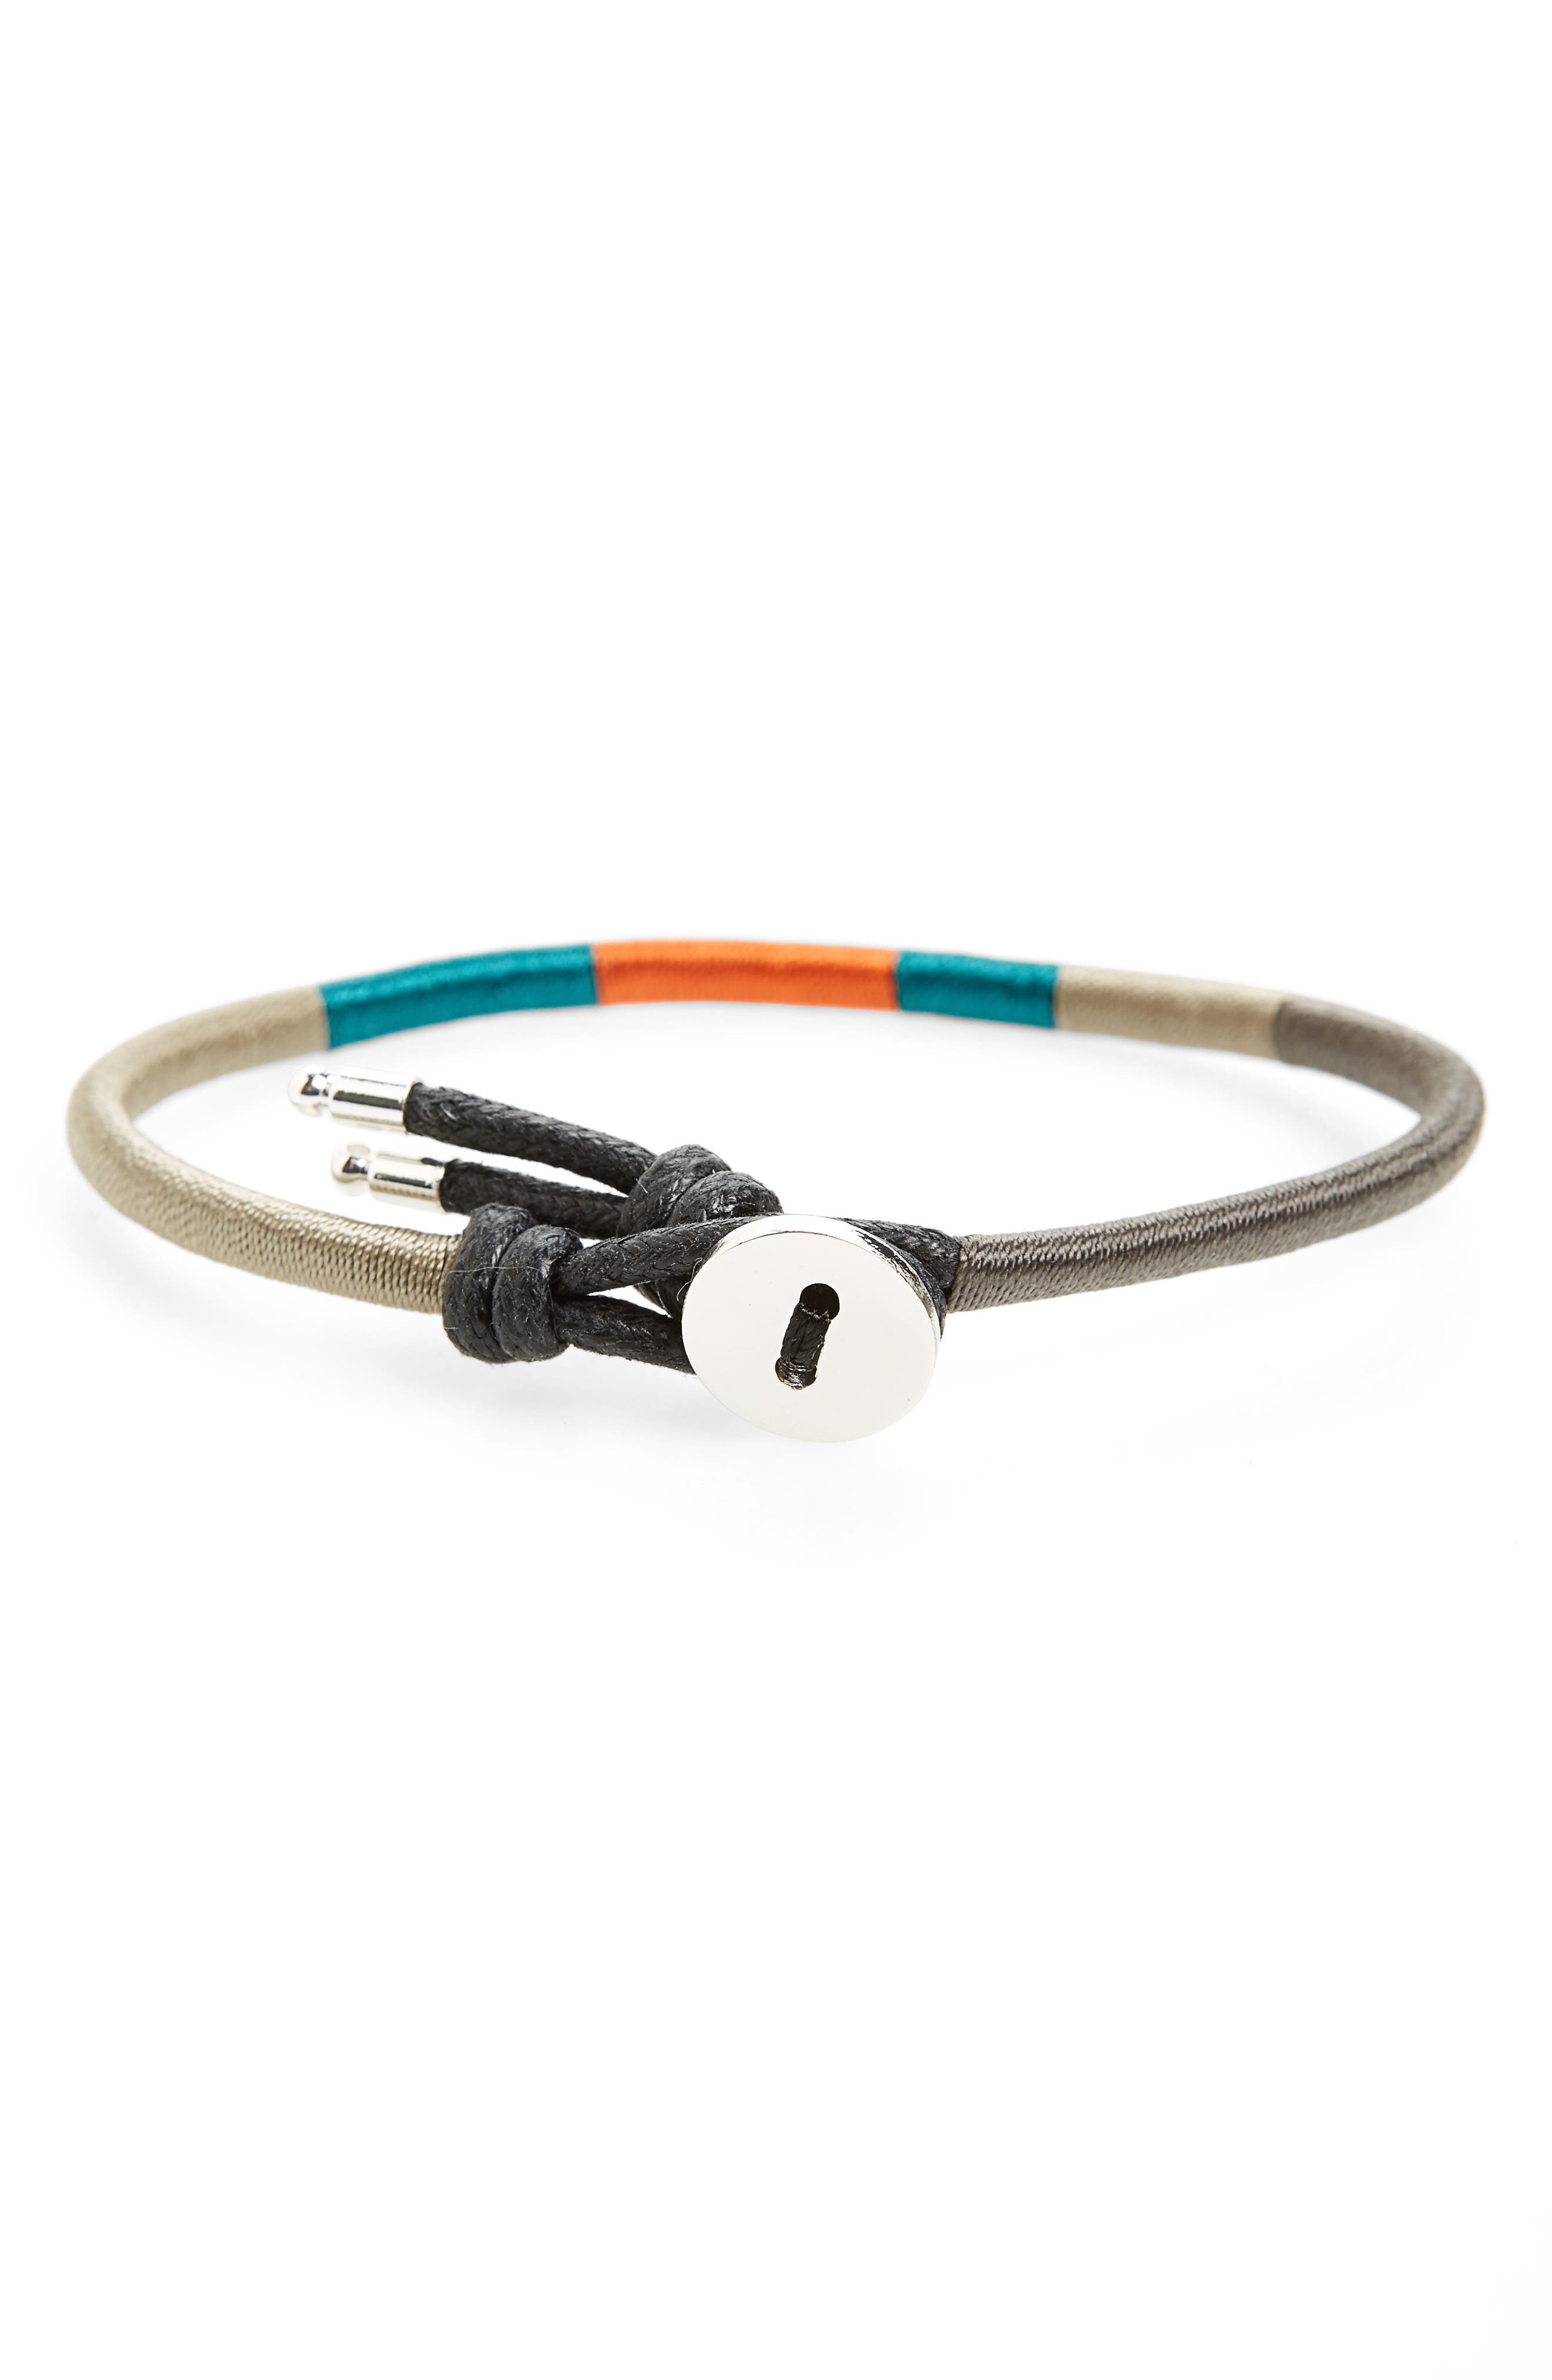 Finn & Taylor Woven Bracelet